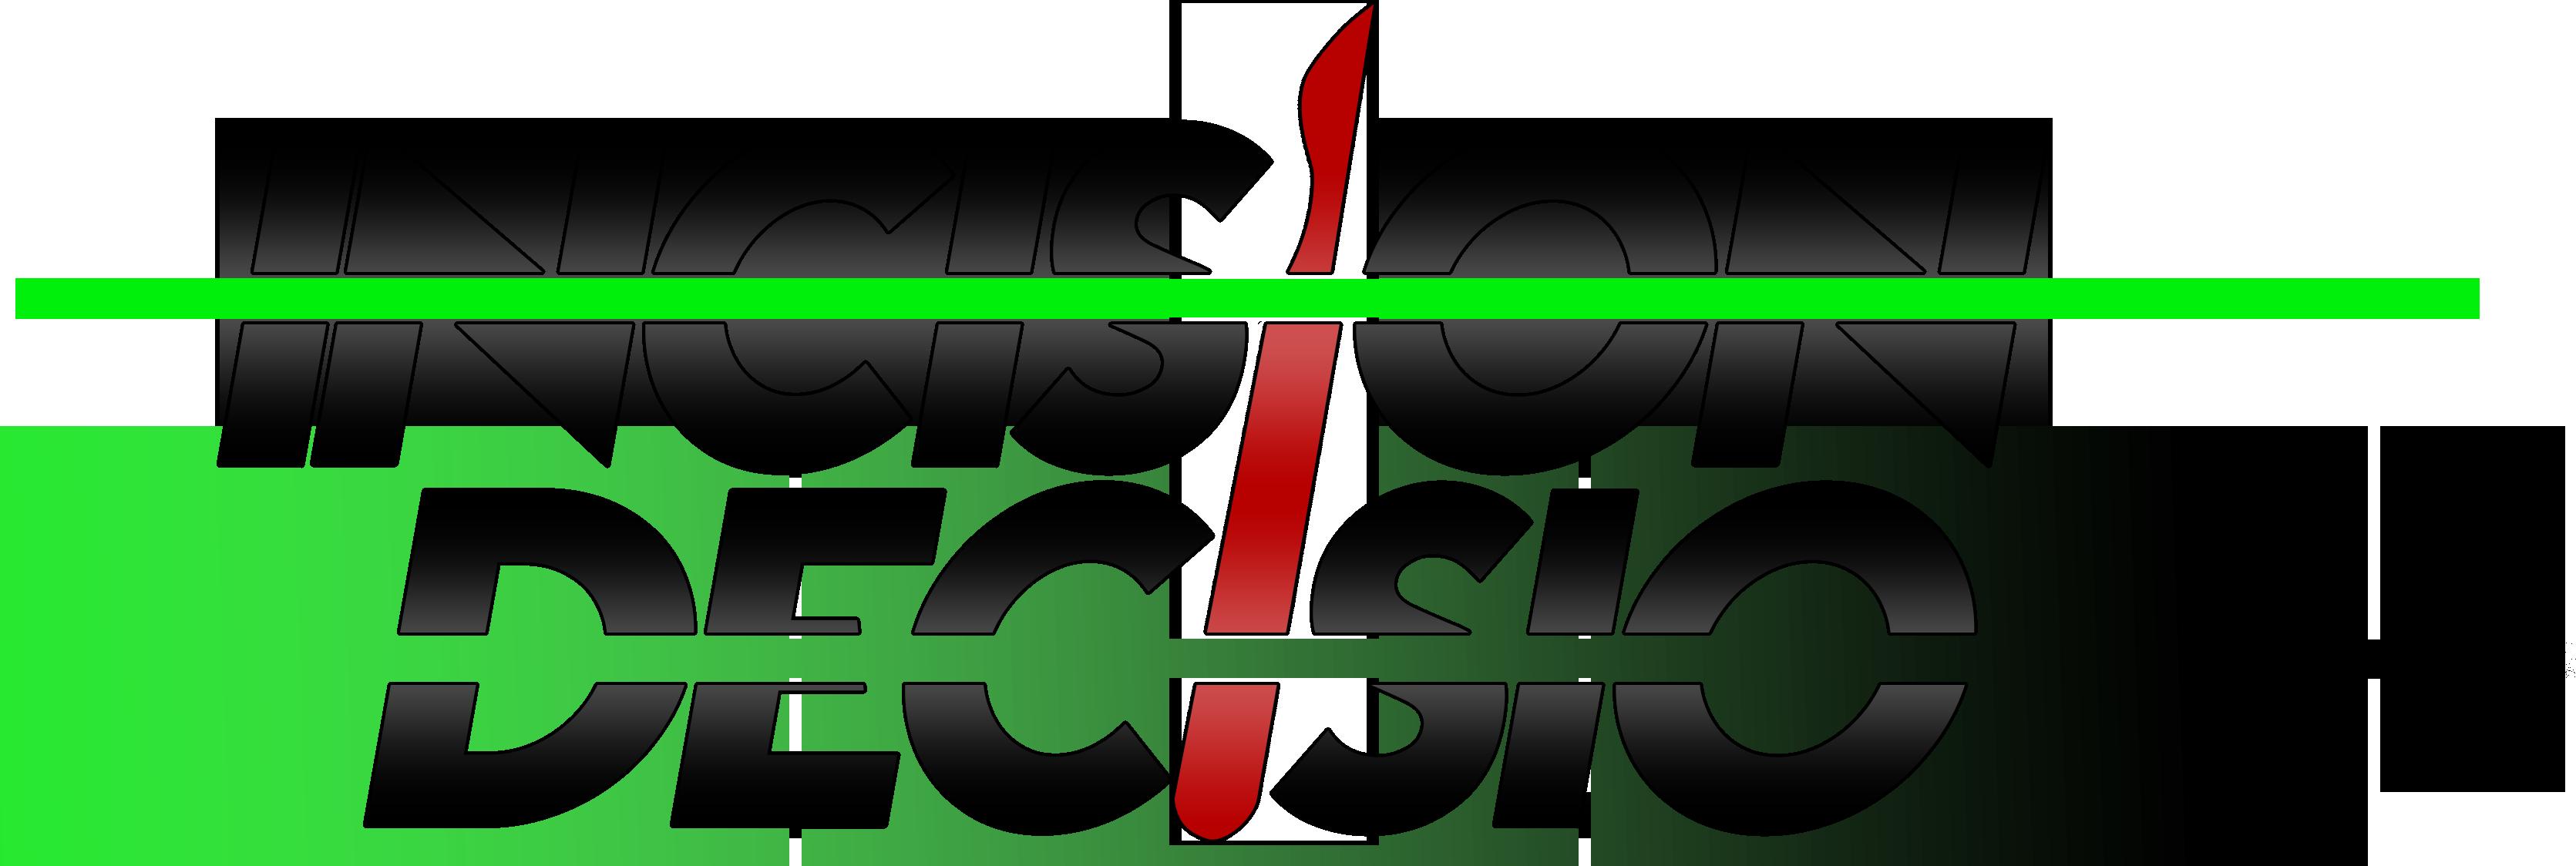 incision Decision